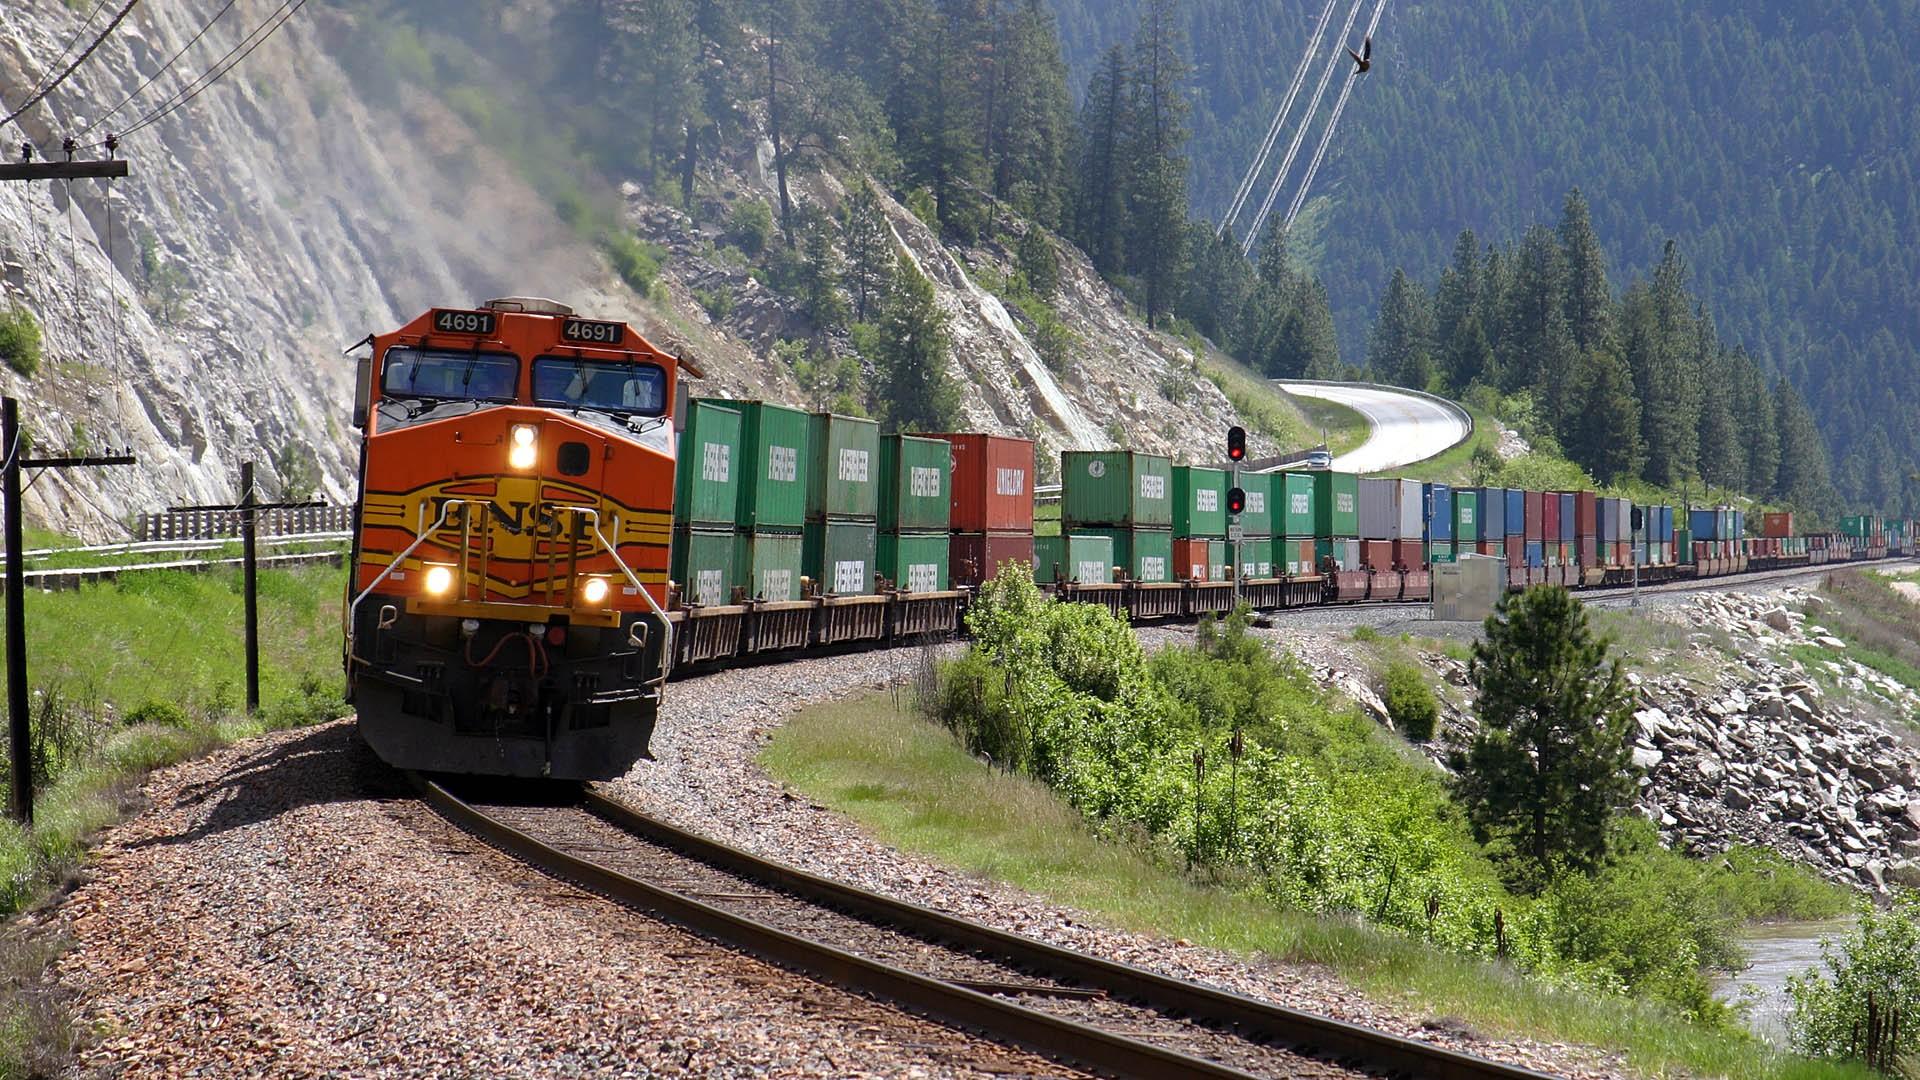 Train Computer Wallpapers Desktop Backgrounds 1920x1080 ID295865 1920x1080